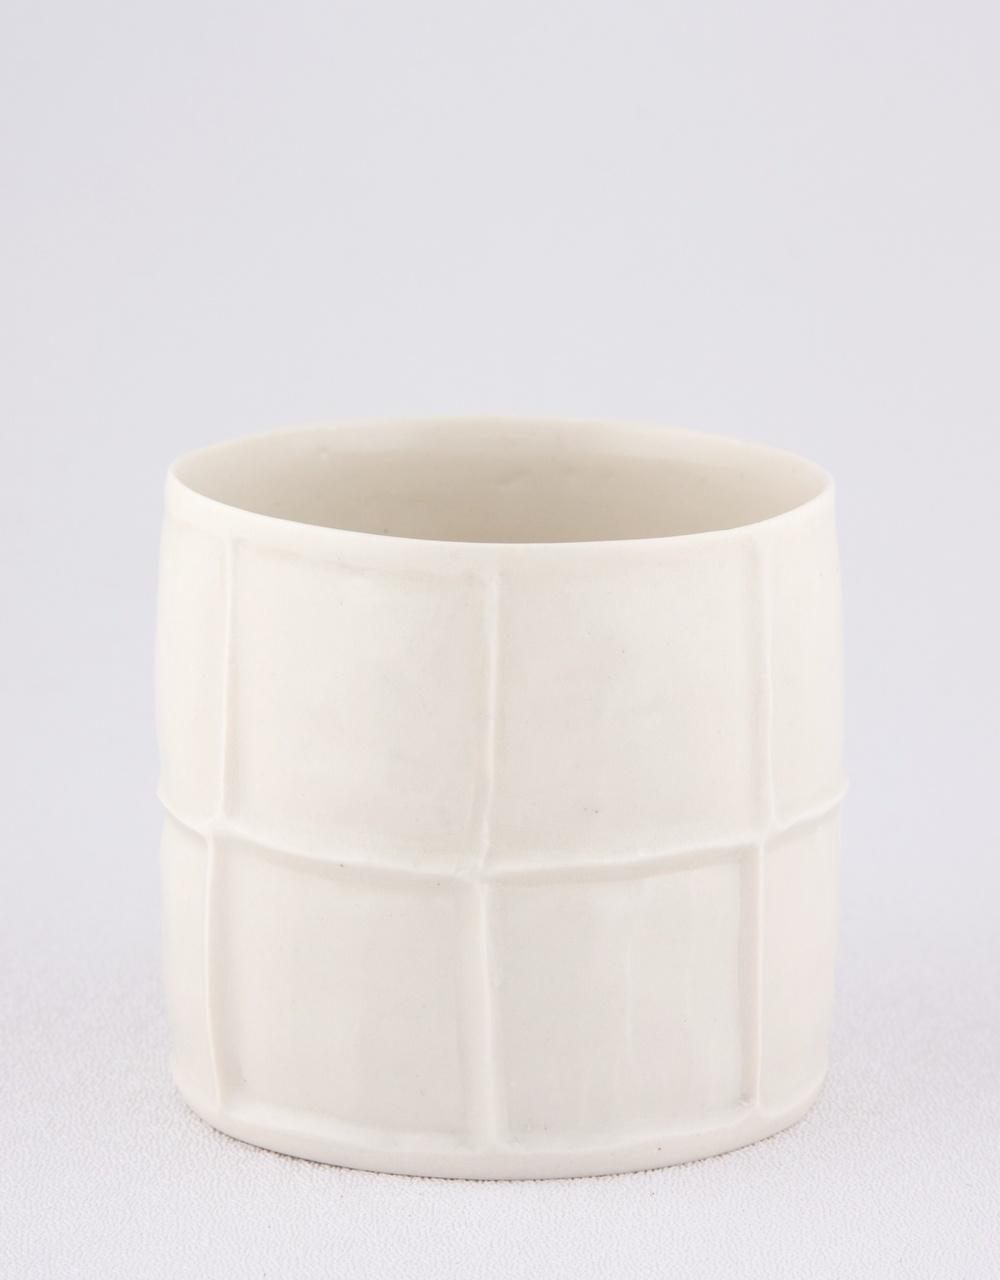 "Shio Kusaka Untitled (cup) 2009 Porcelain 2 3/4"" x 3"" SK014"